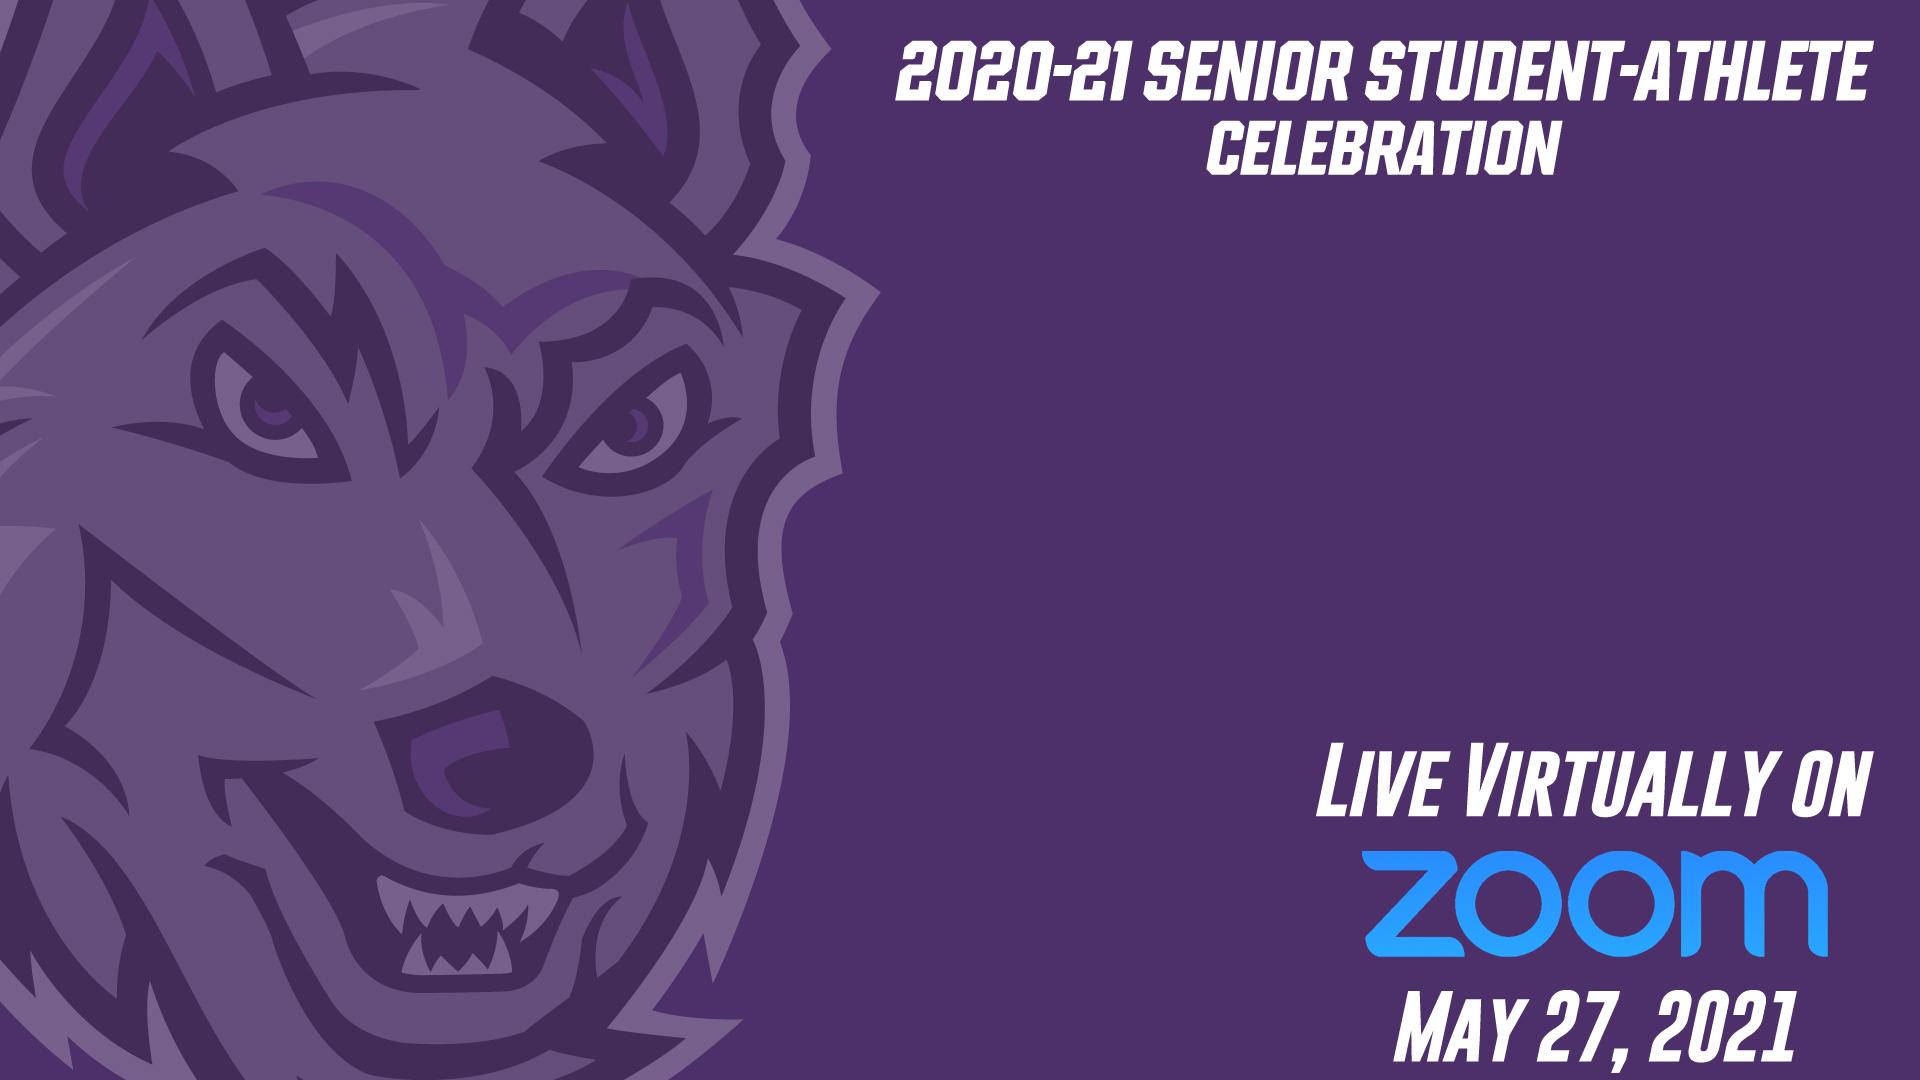 Department of Athletics to Host Virtual Senior Student-Athlete Celebration May 27